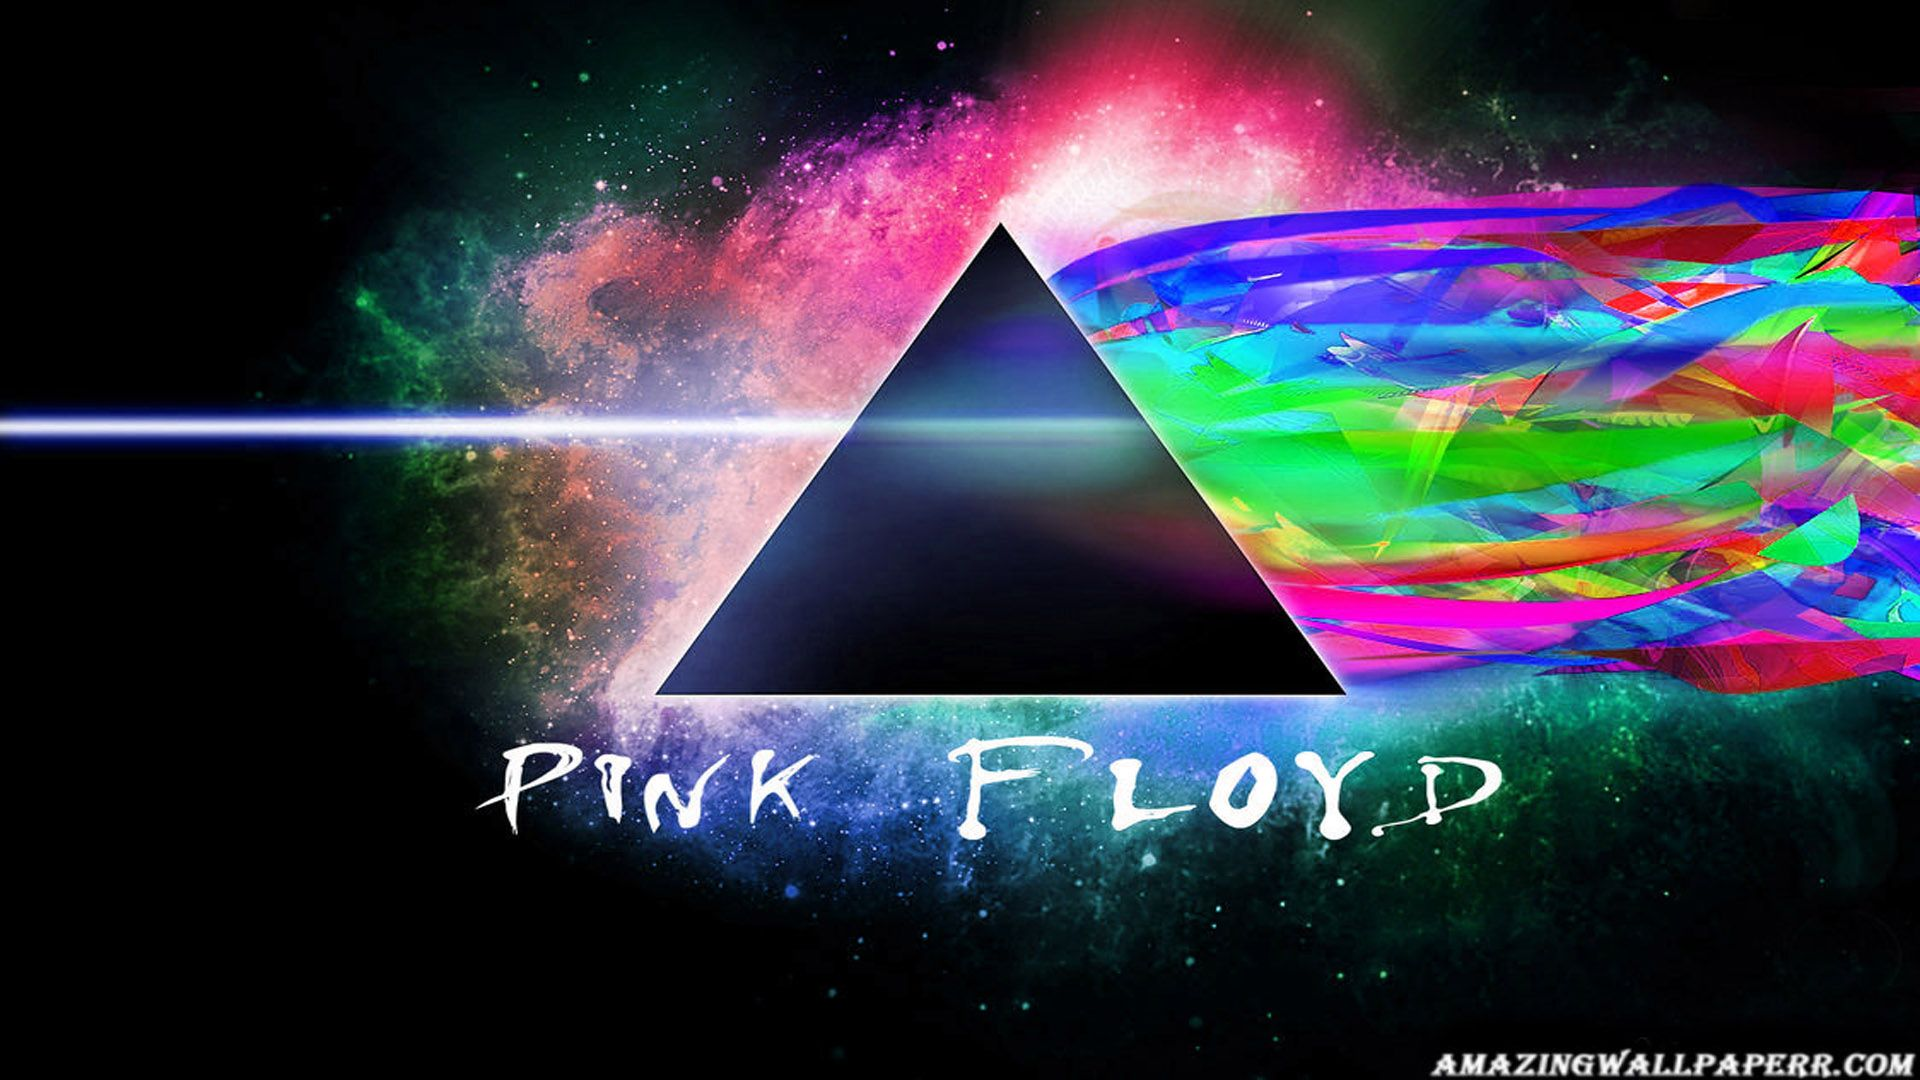 Abstract Pink Floyd Wallpaper Pink Floyd 286568 Hd